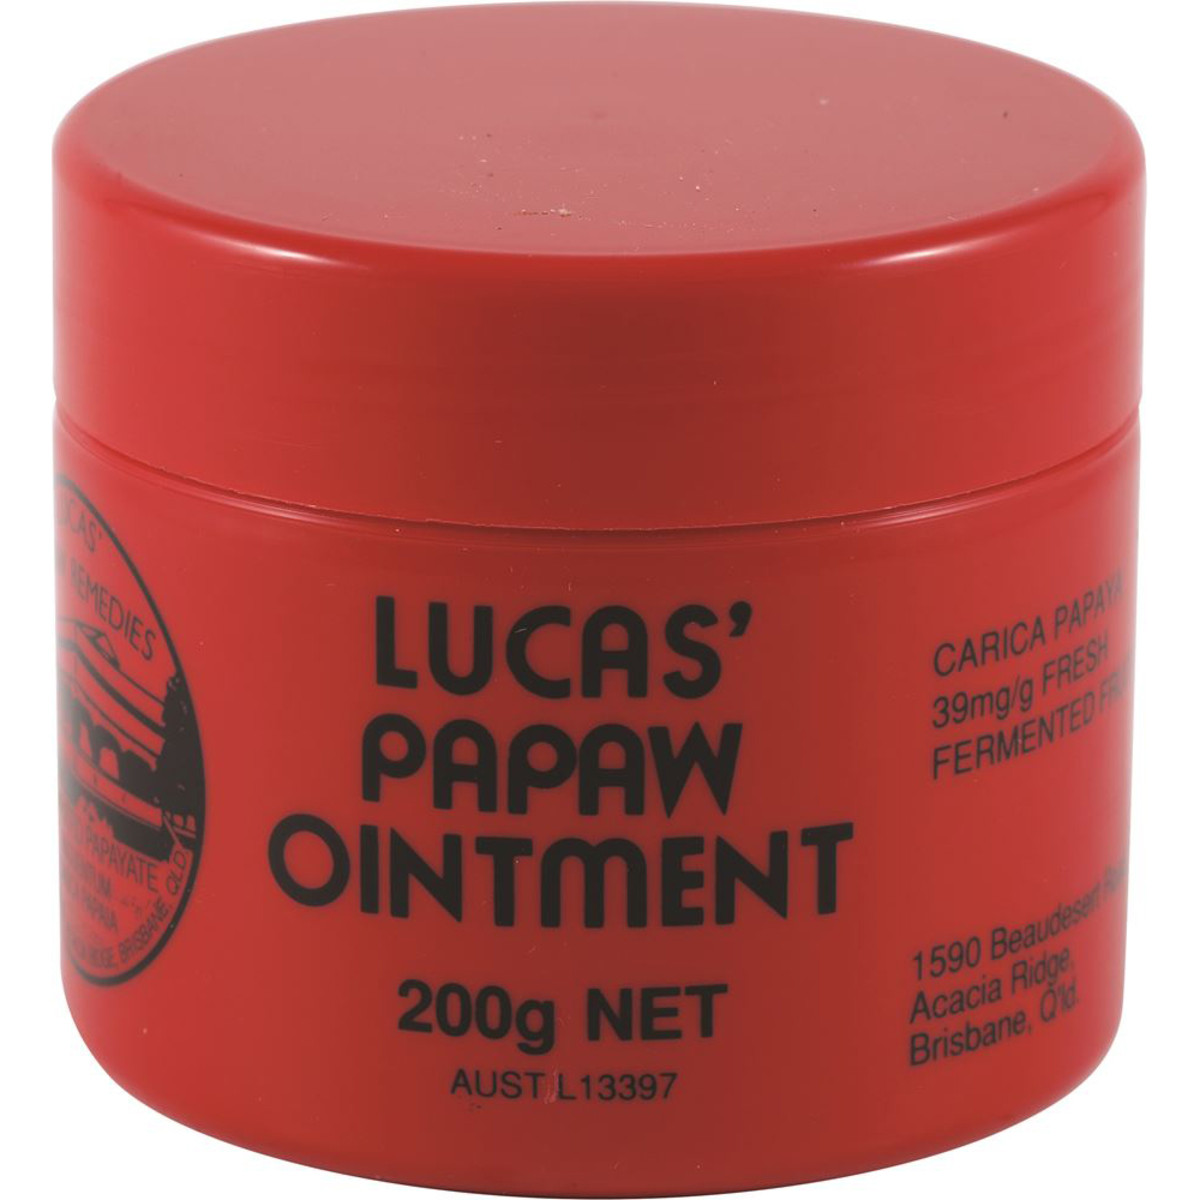 LUCAS' PAWPAW REMEDIES PAPAW OINTMENT 200G